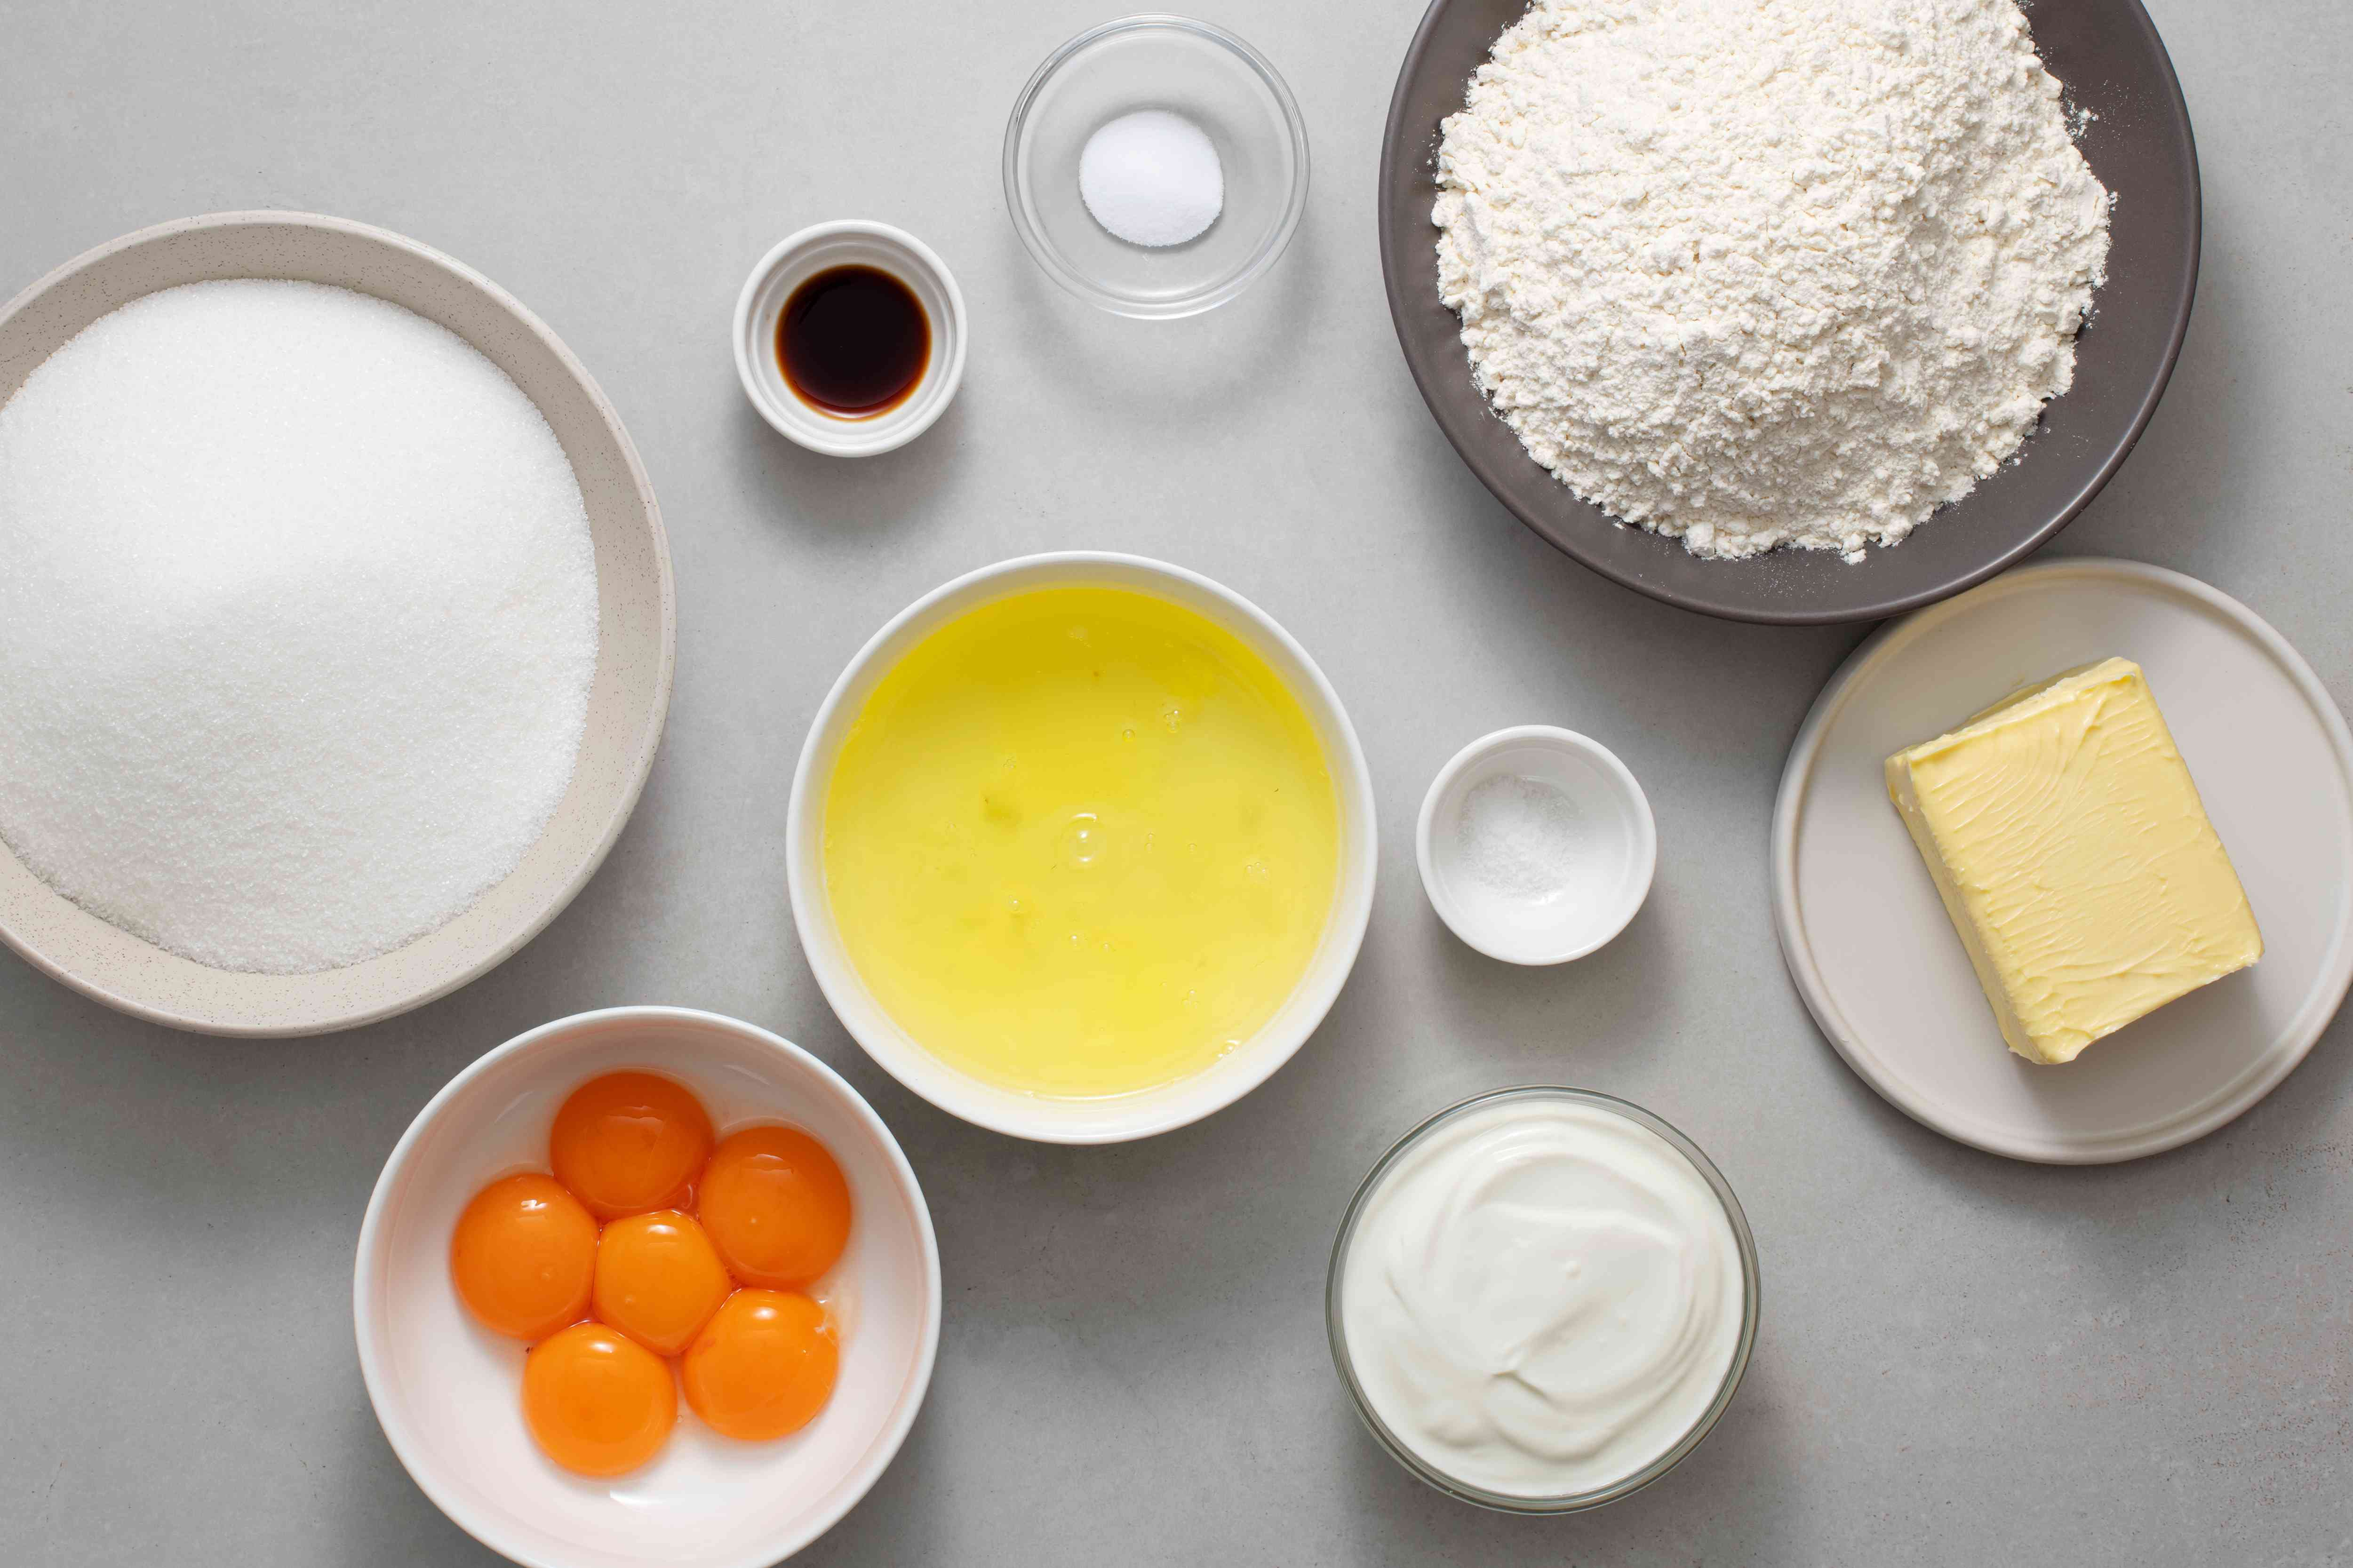 Ingredients of sour cream pound cake